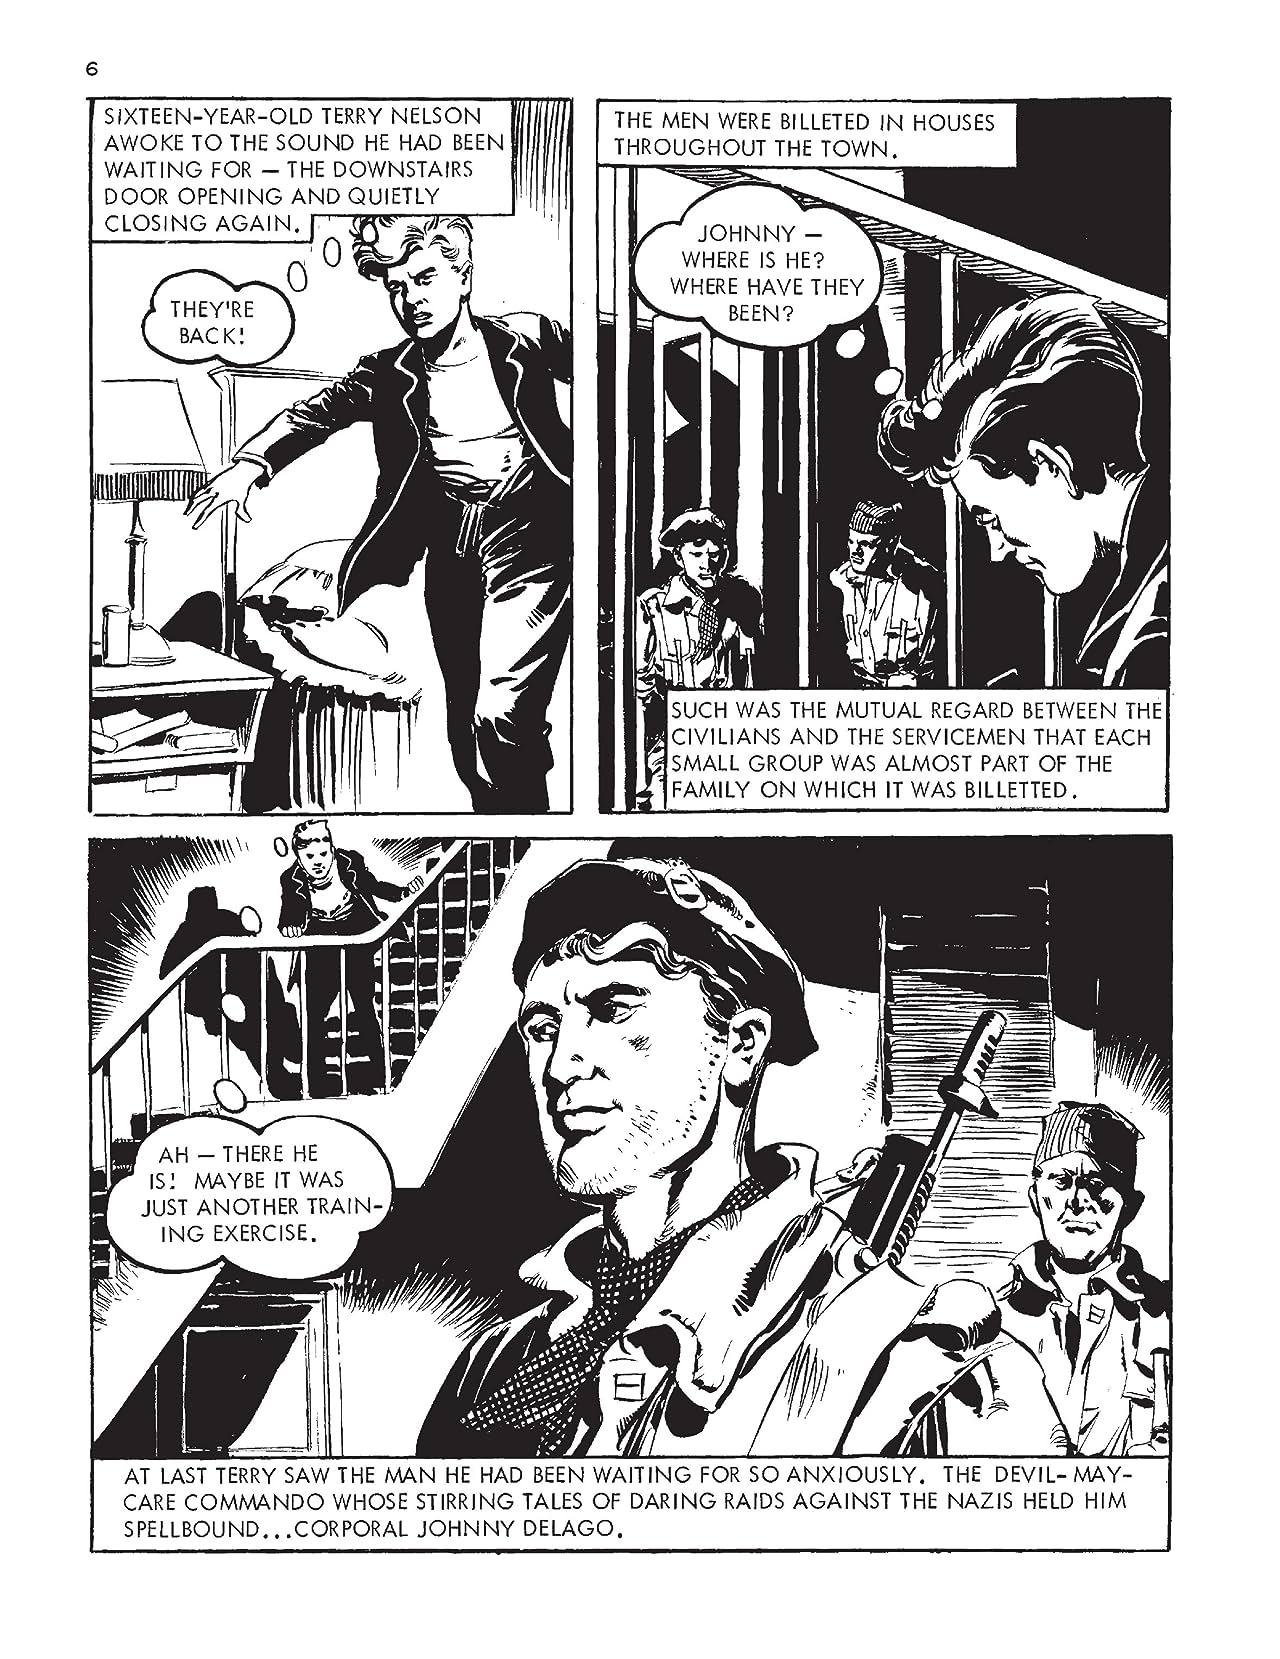 Commando #4920: Half-Pint Commando